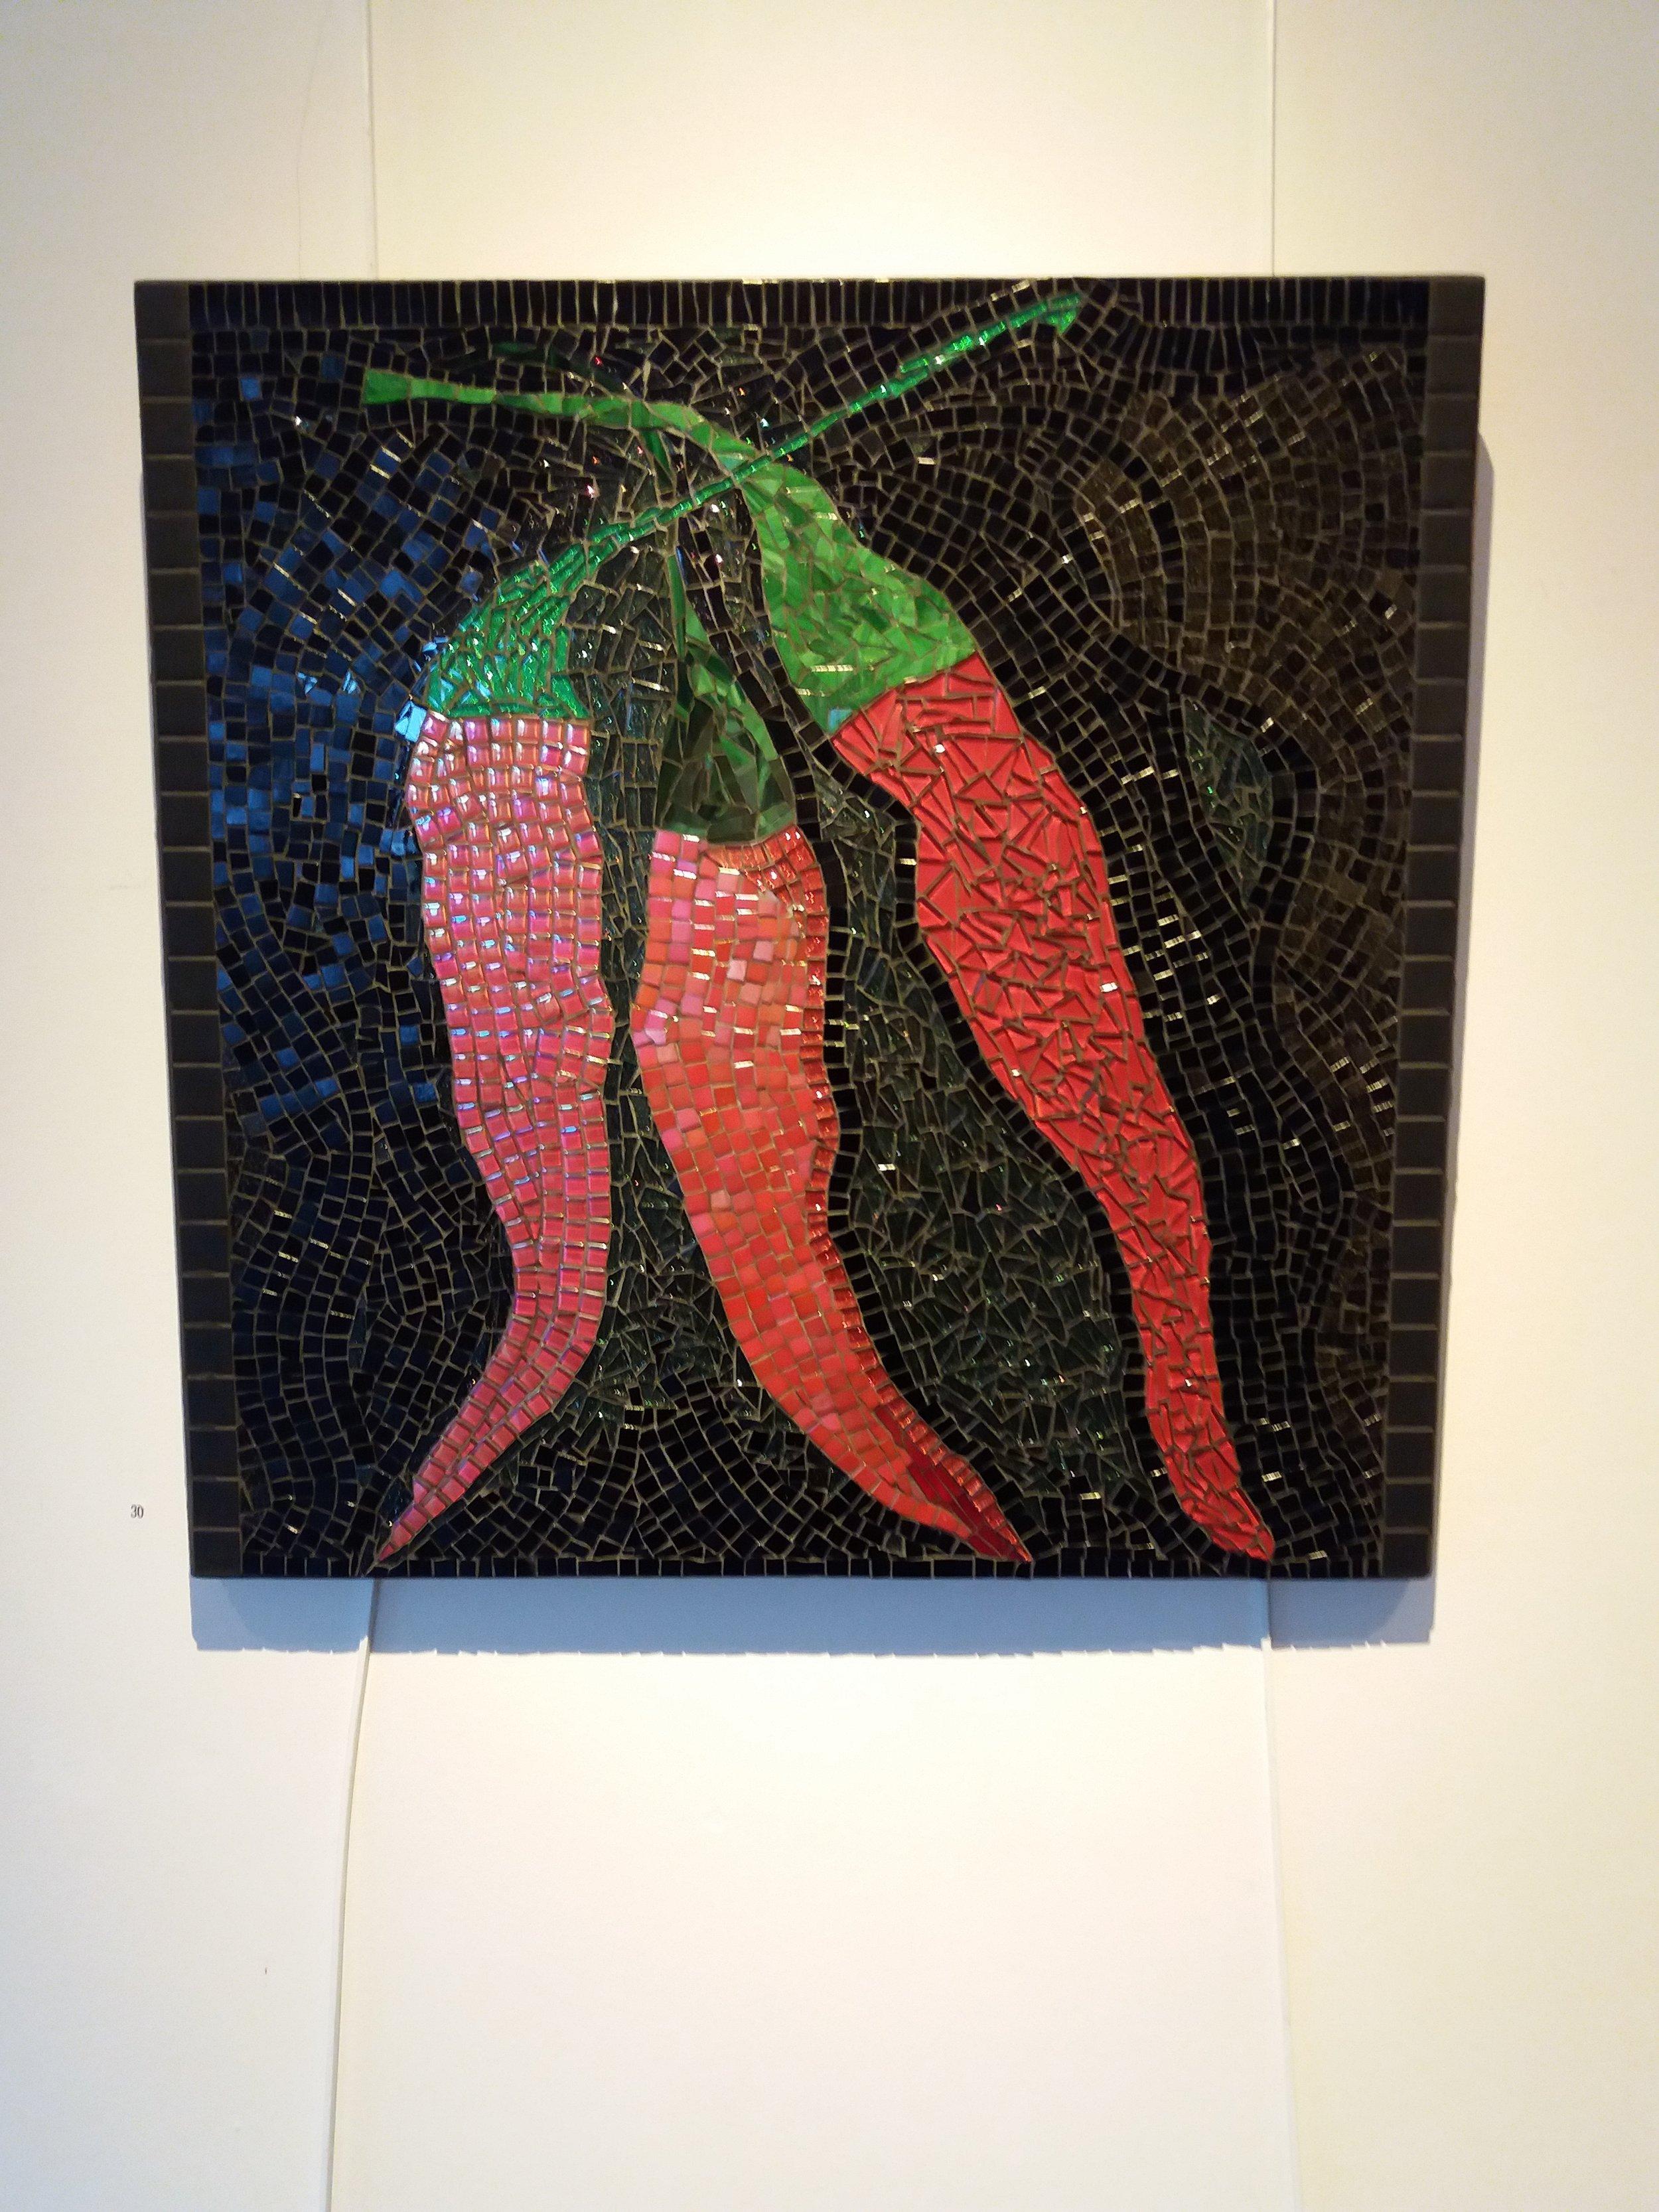 Red Hot Chillis mosaic